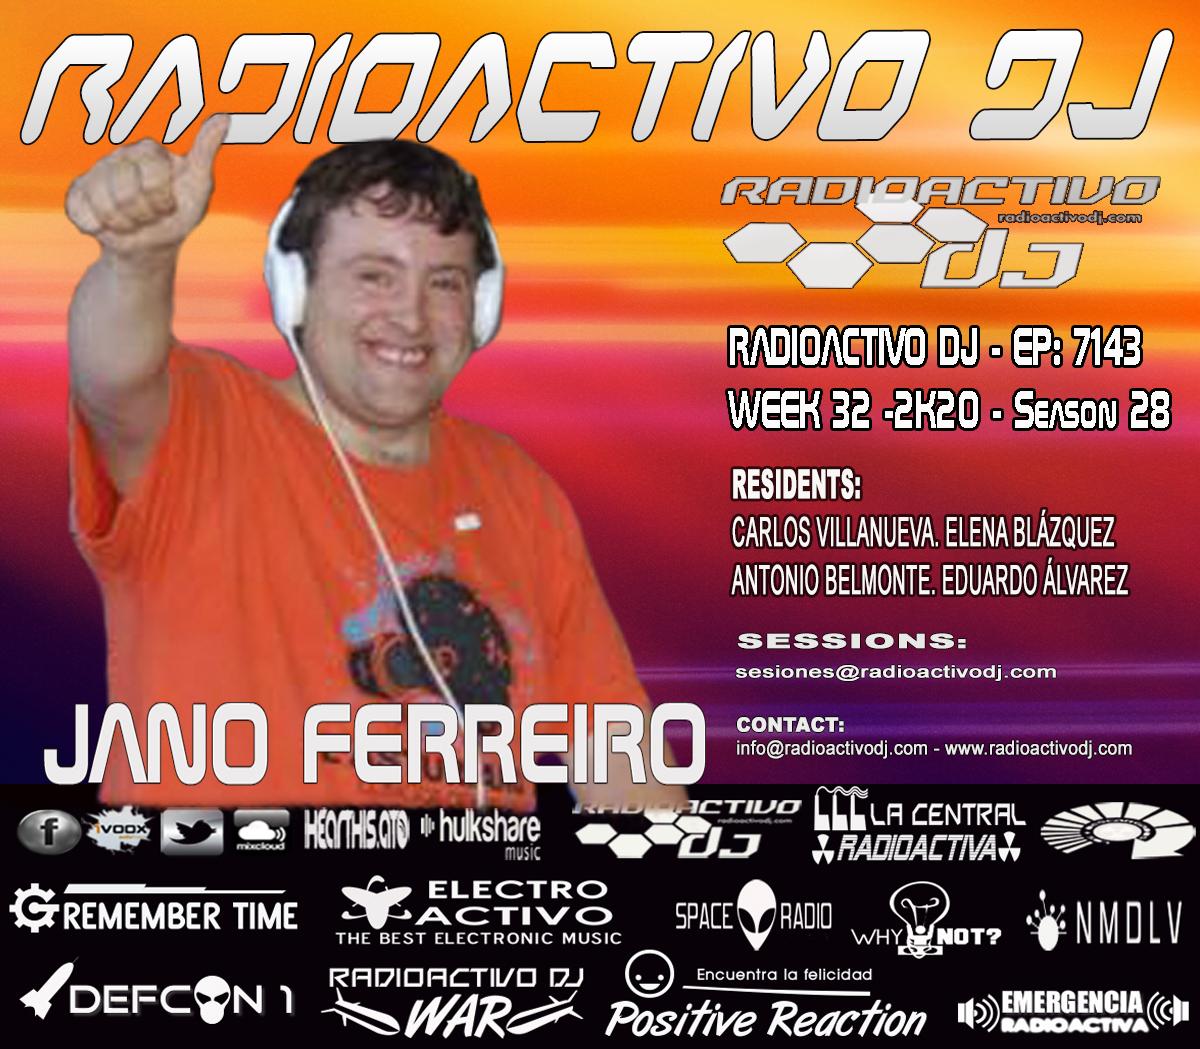 RADIOACTIVO-DJ-32-2020